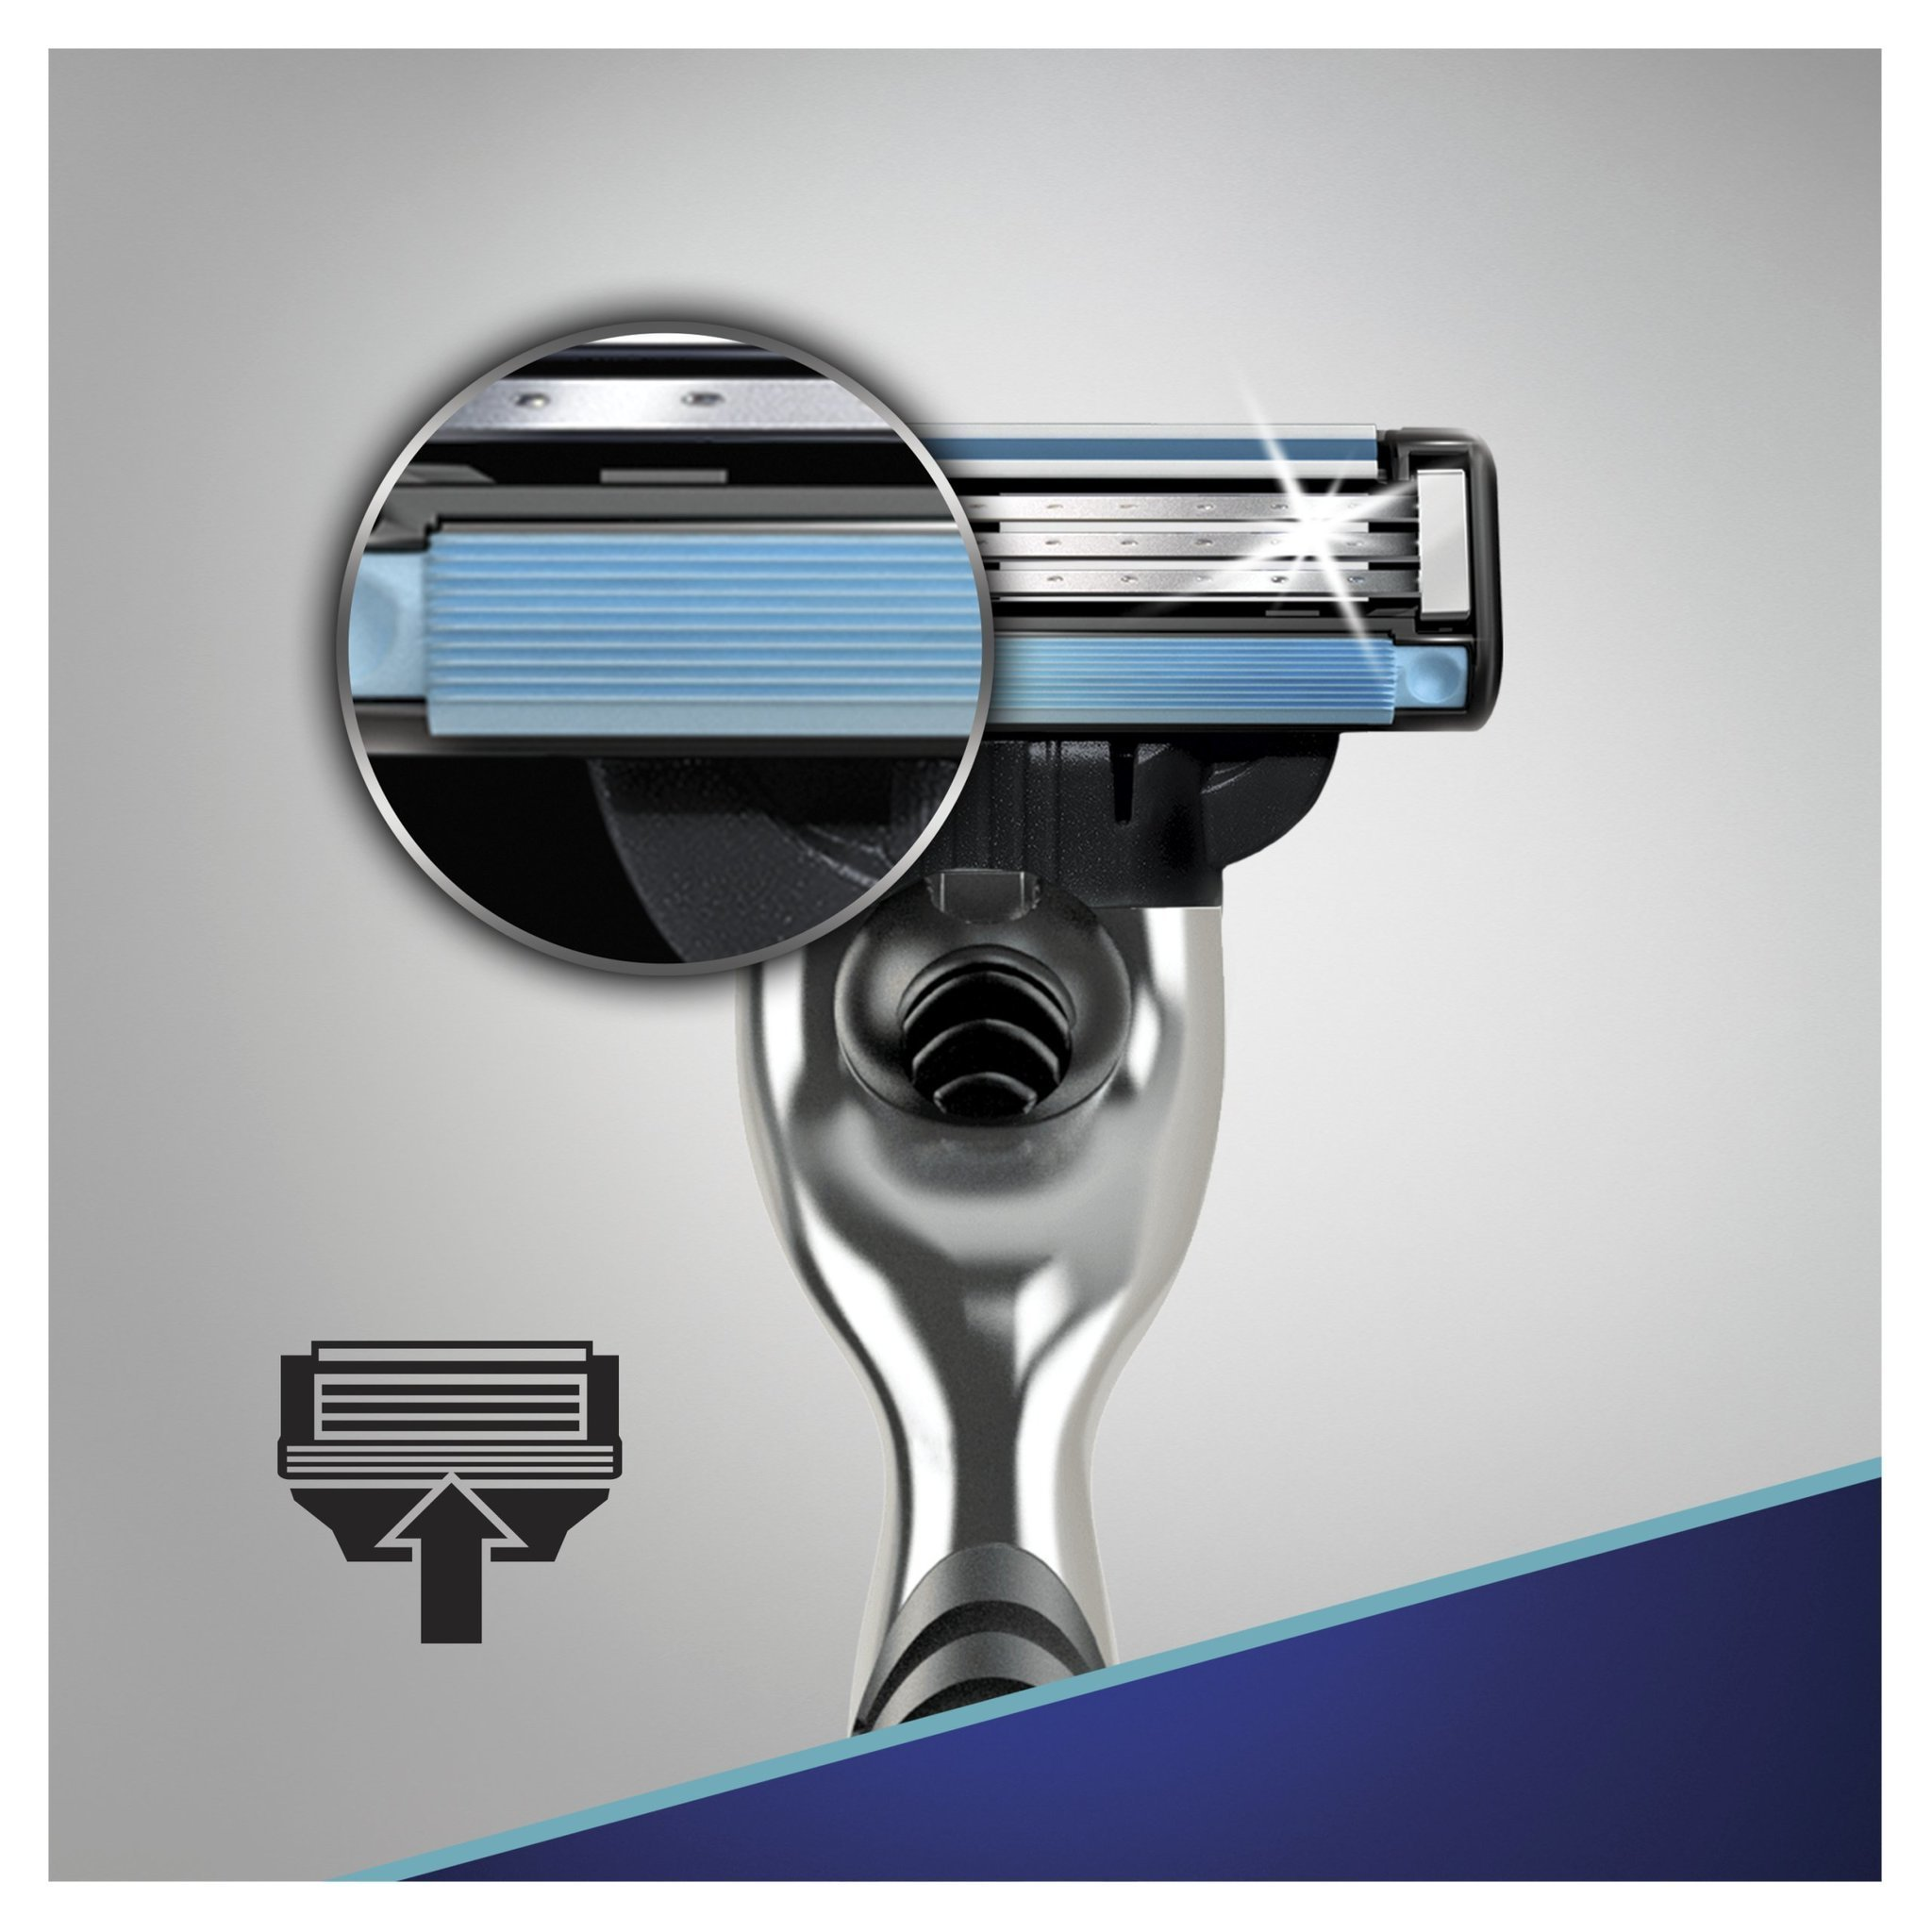 Gillette mach3 комплект (5х8) 40 шт. (Цена за 1 пачку 783р.)